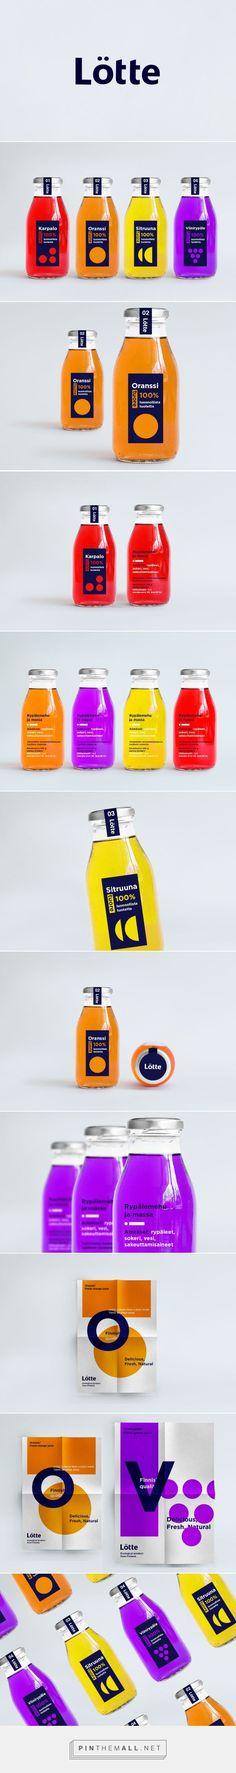 Lotte Juice Packaging by Anastasia Bakusheva   Fivestar Branding Agency – Design and Branding Agency & Curated Inspiration Gallery